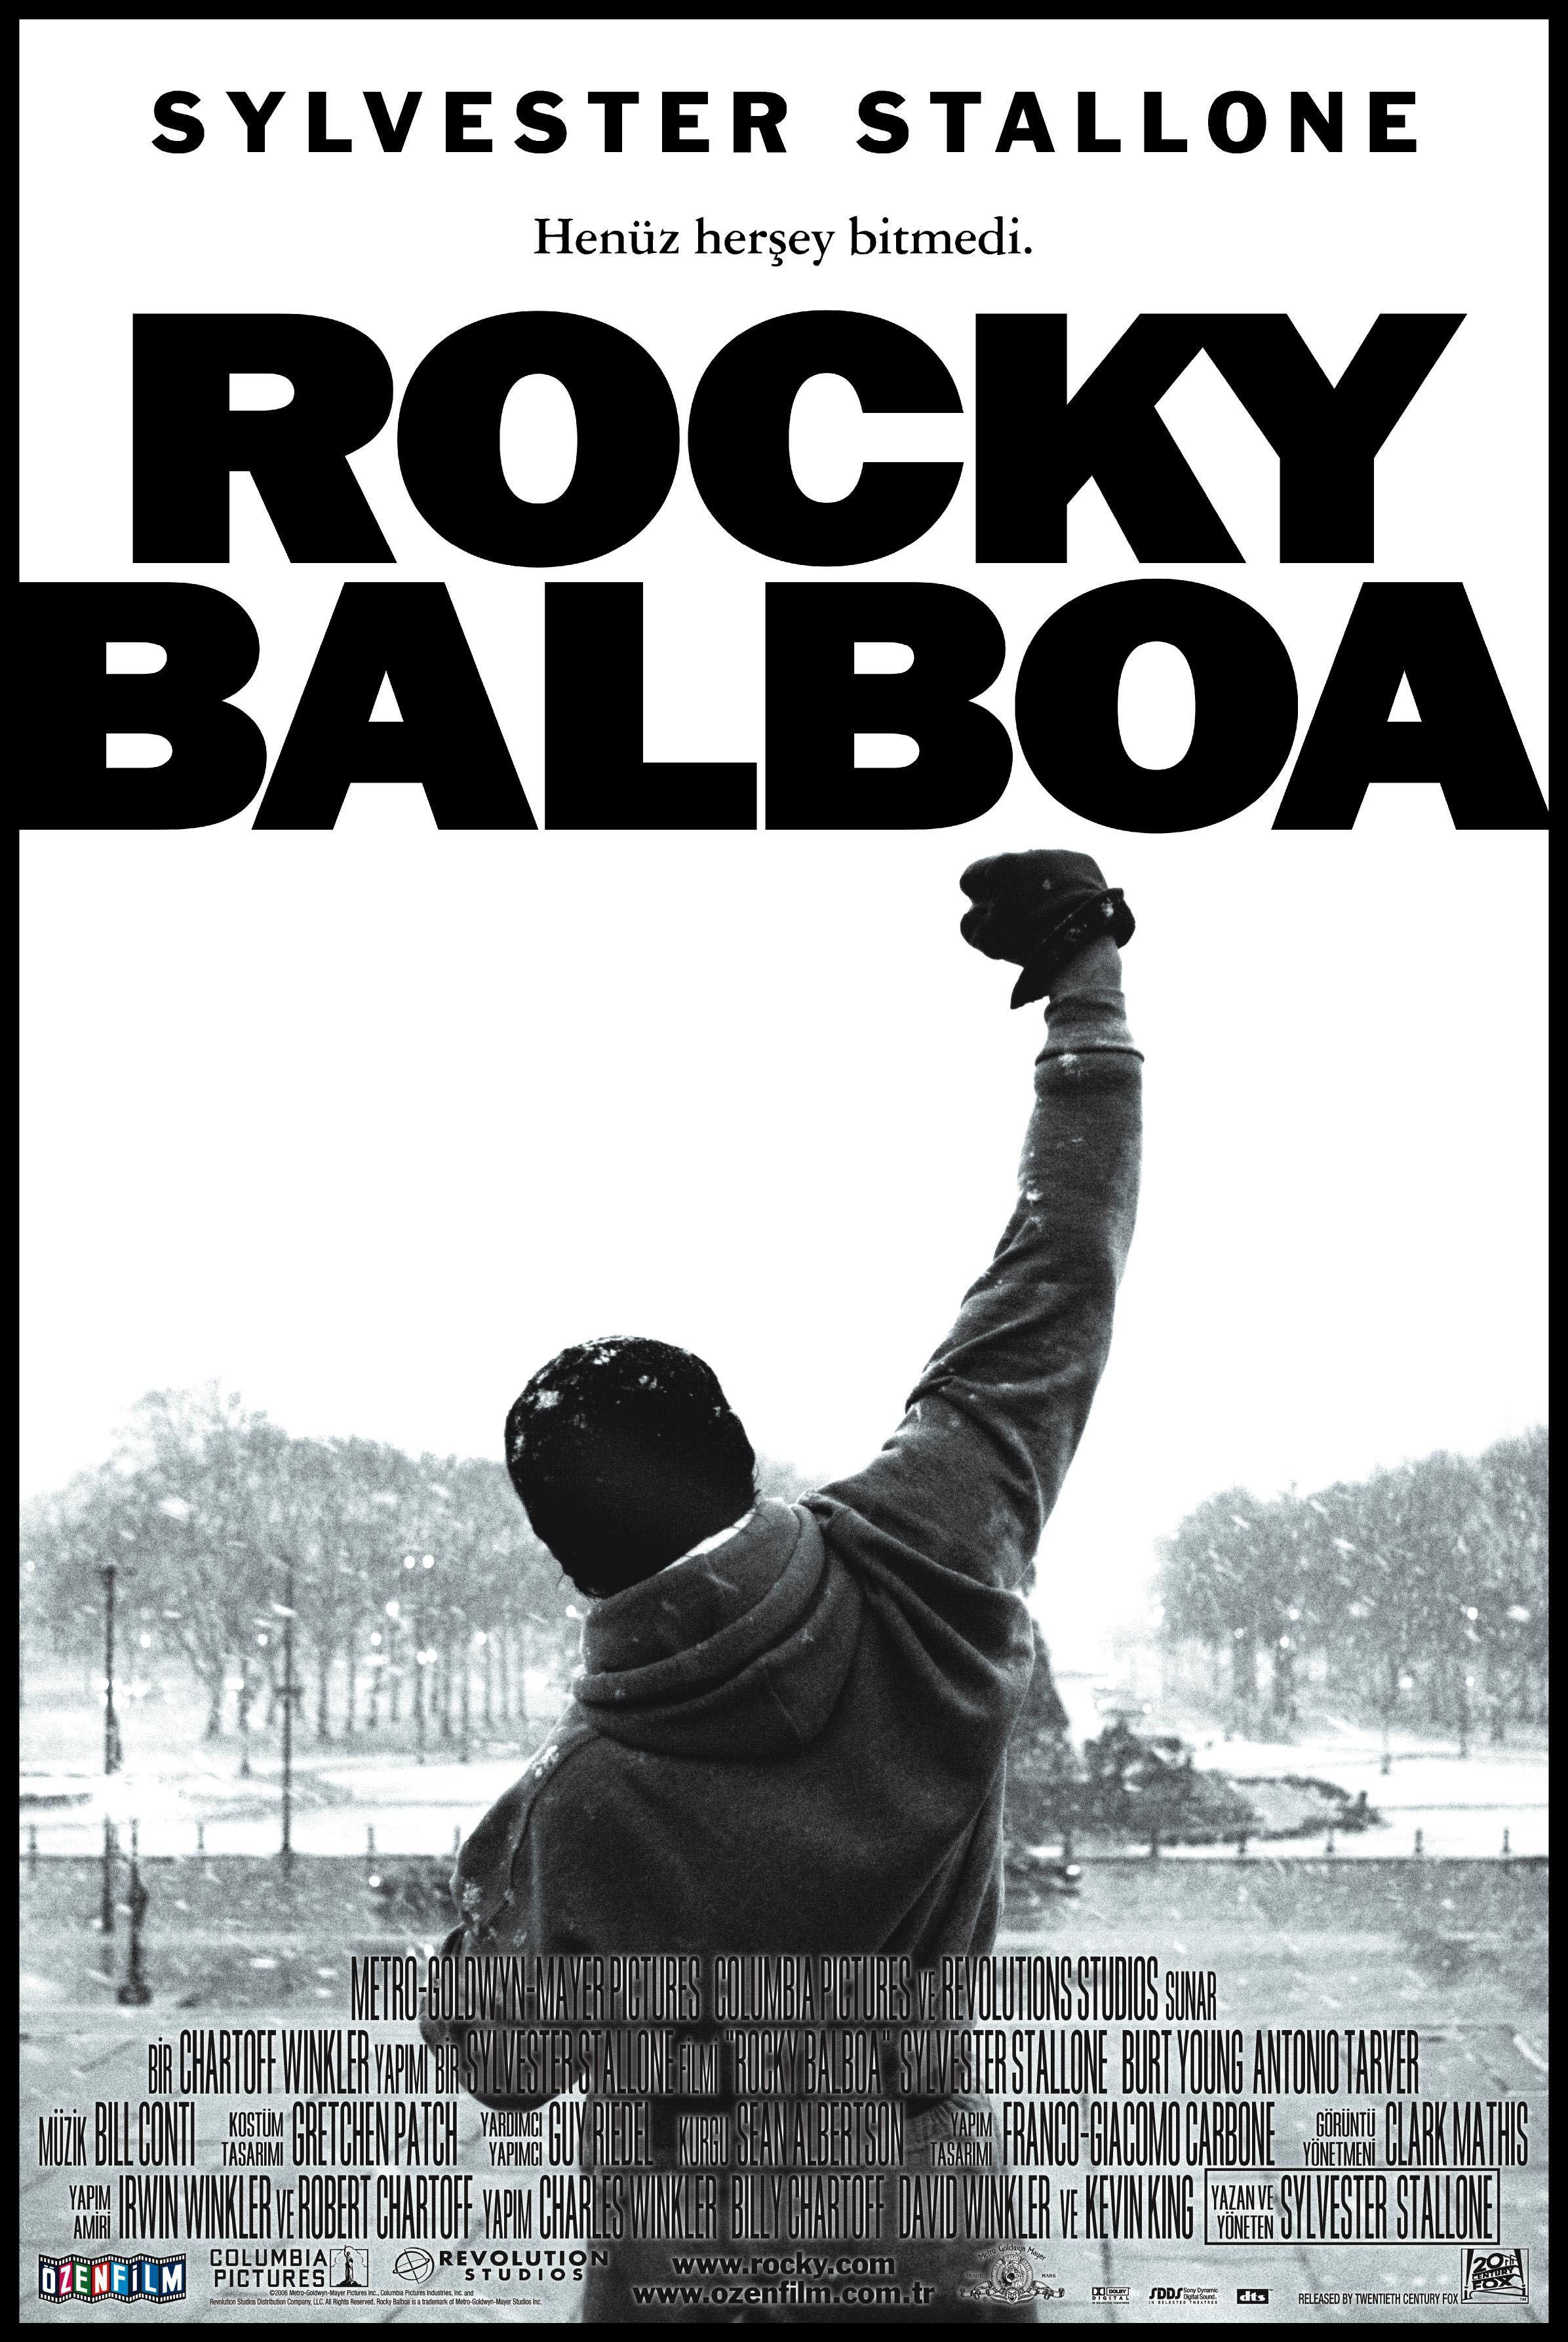 406559406 C17cb3bae6 O Rocky Peliculas Rocky Balboa Peliculas Completas